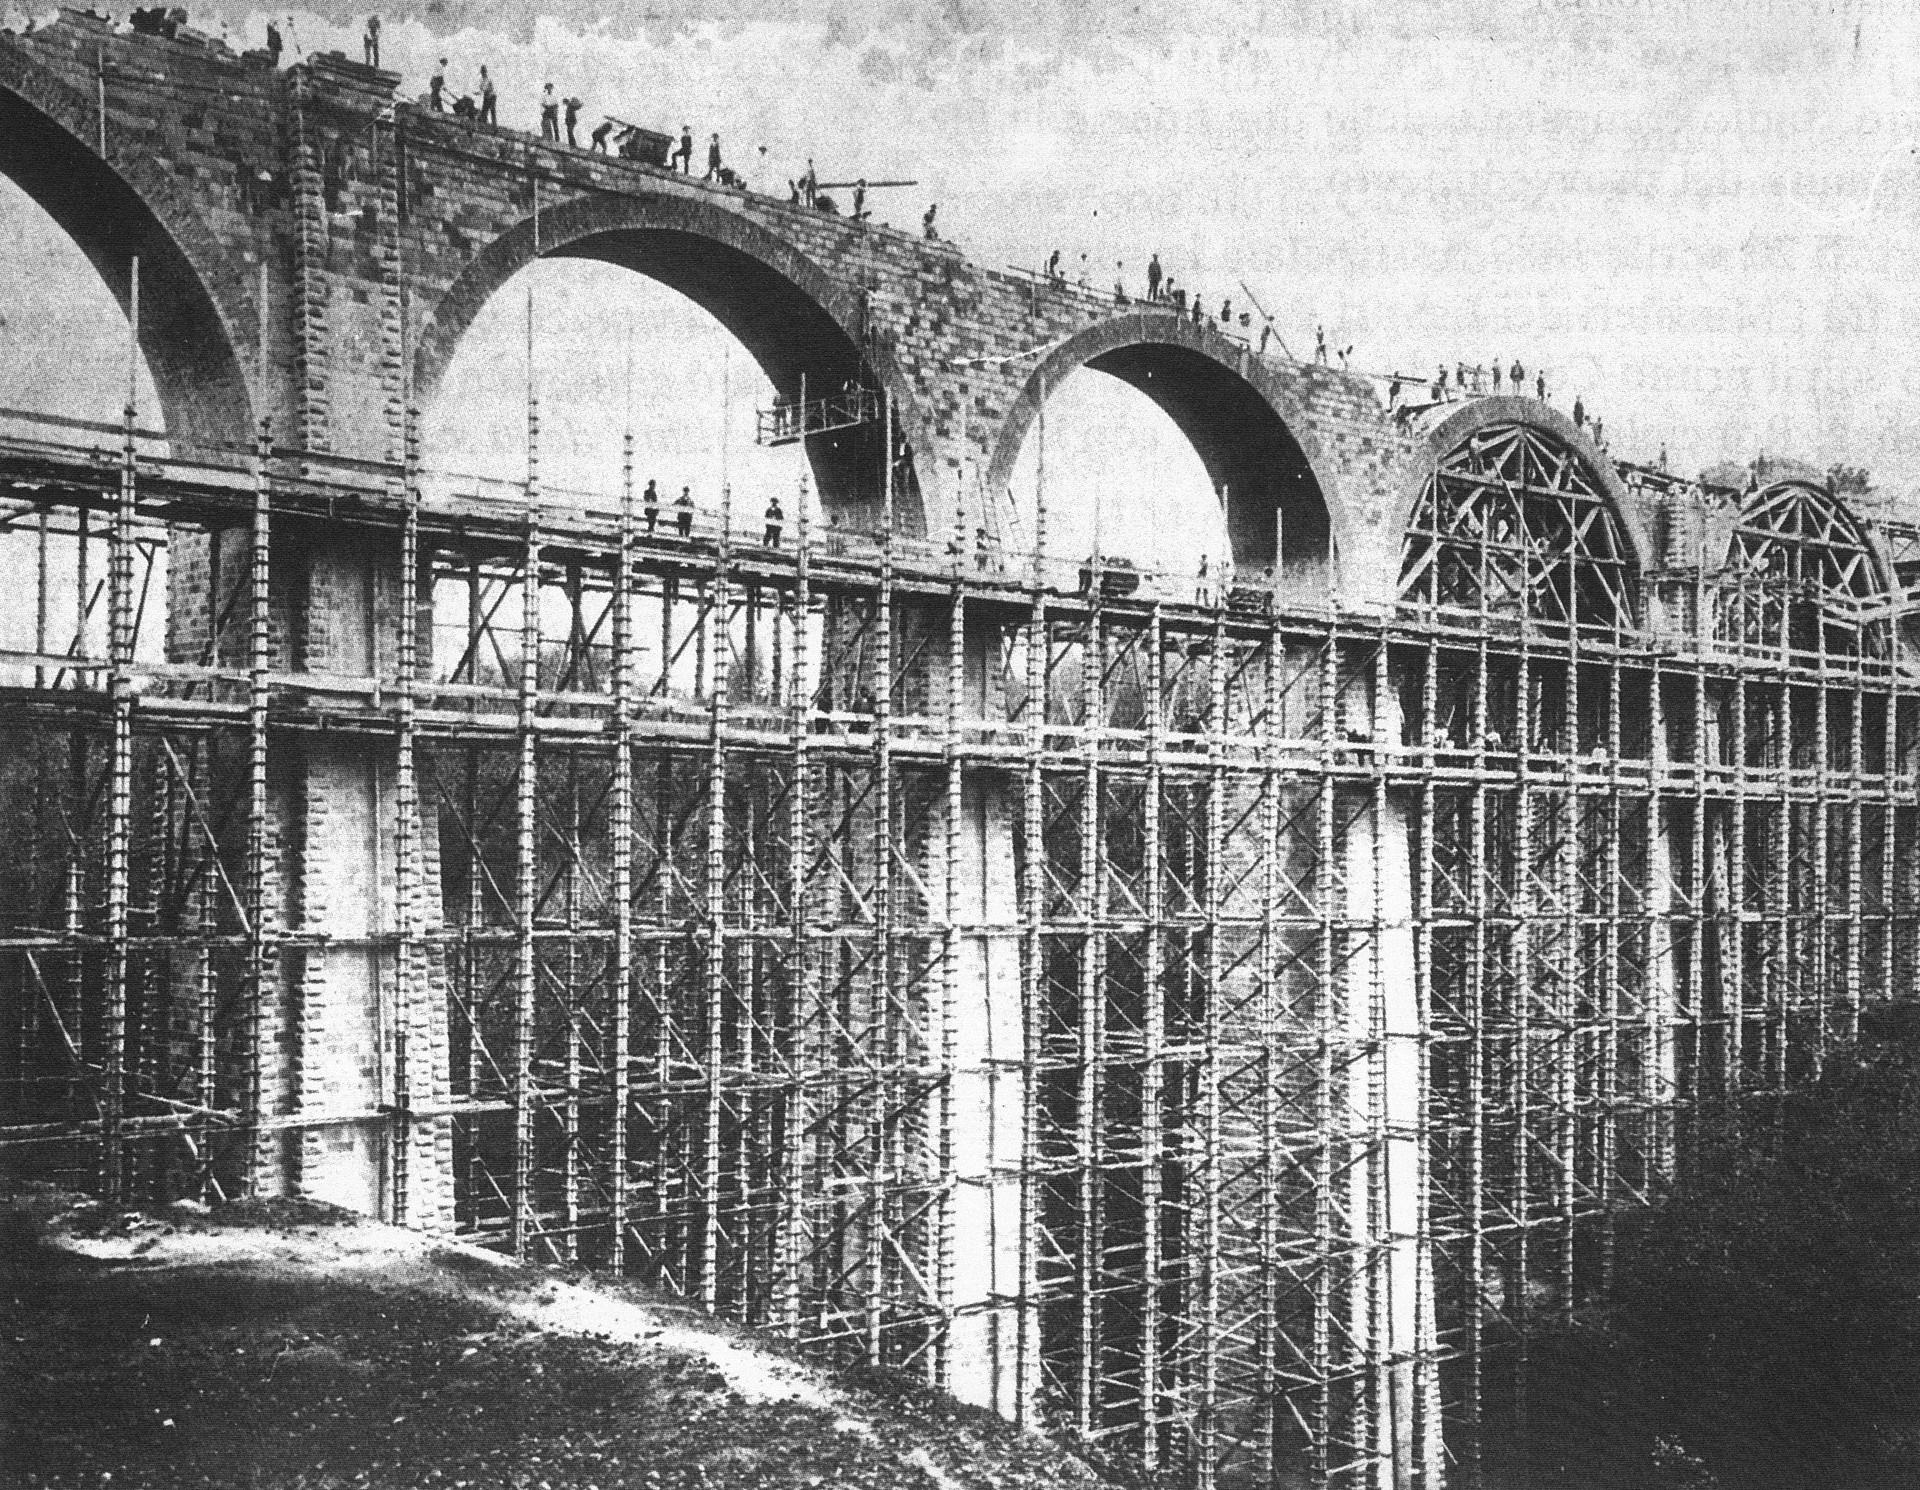 Civitavecchia-Capranica: conversion of abandoned railway stations